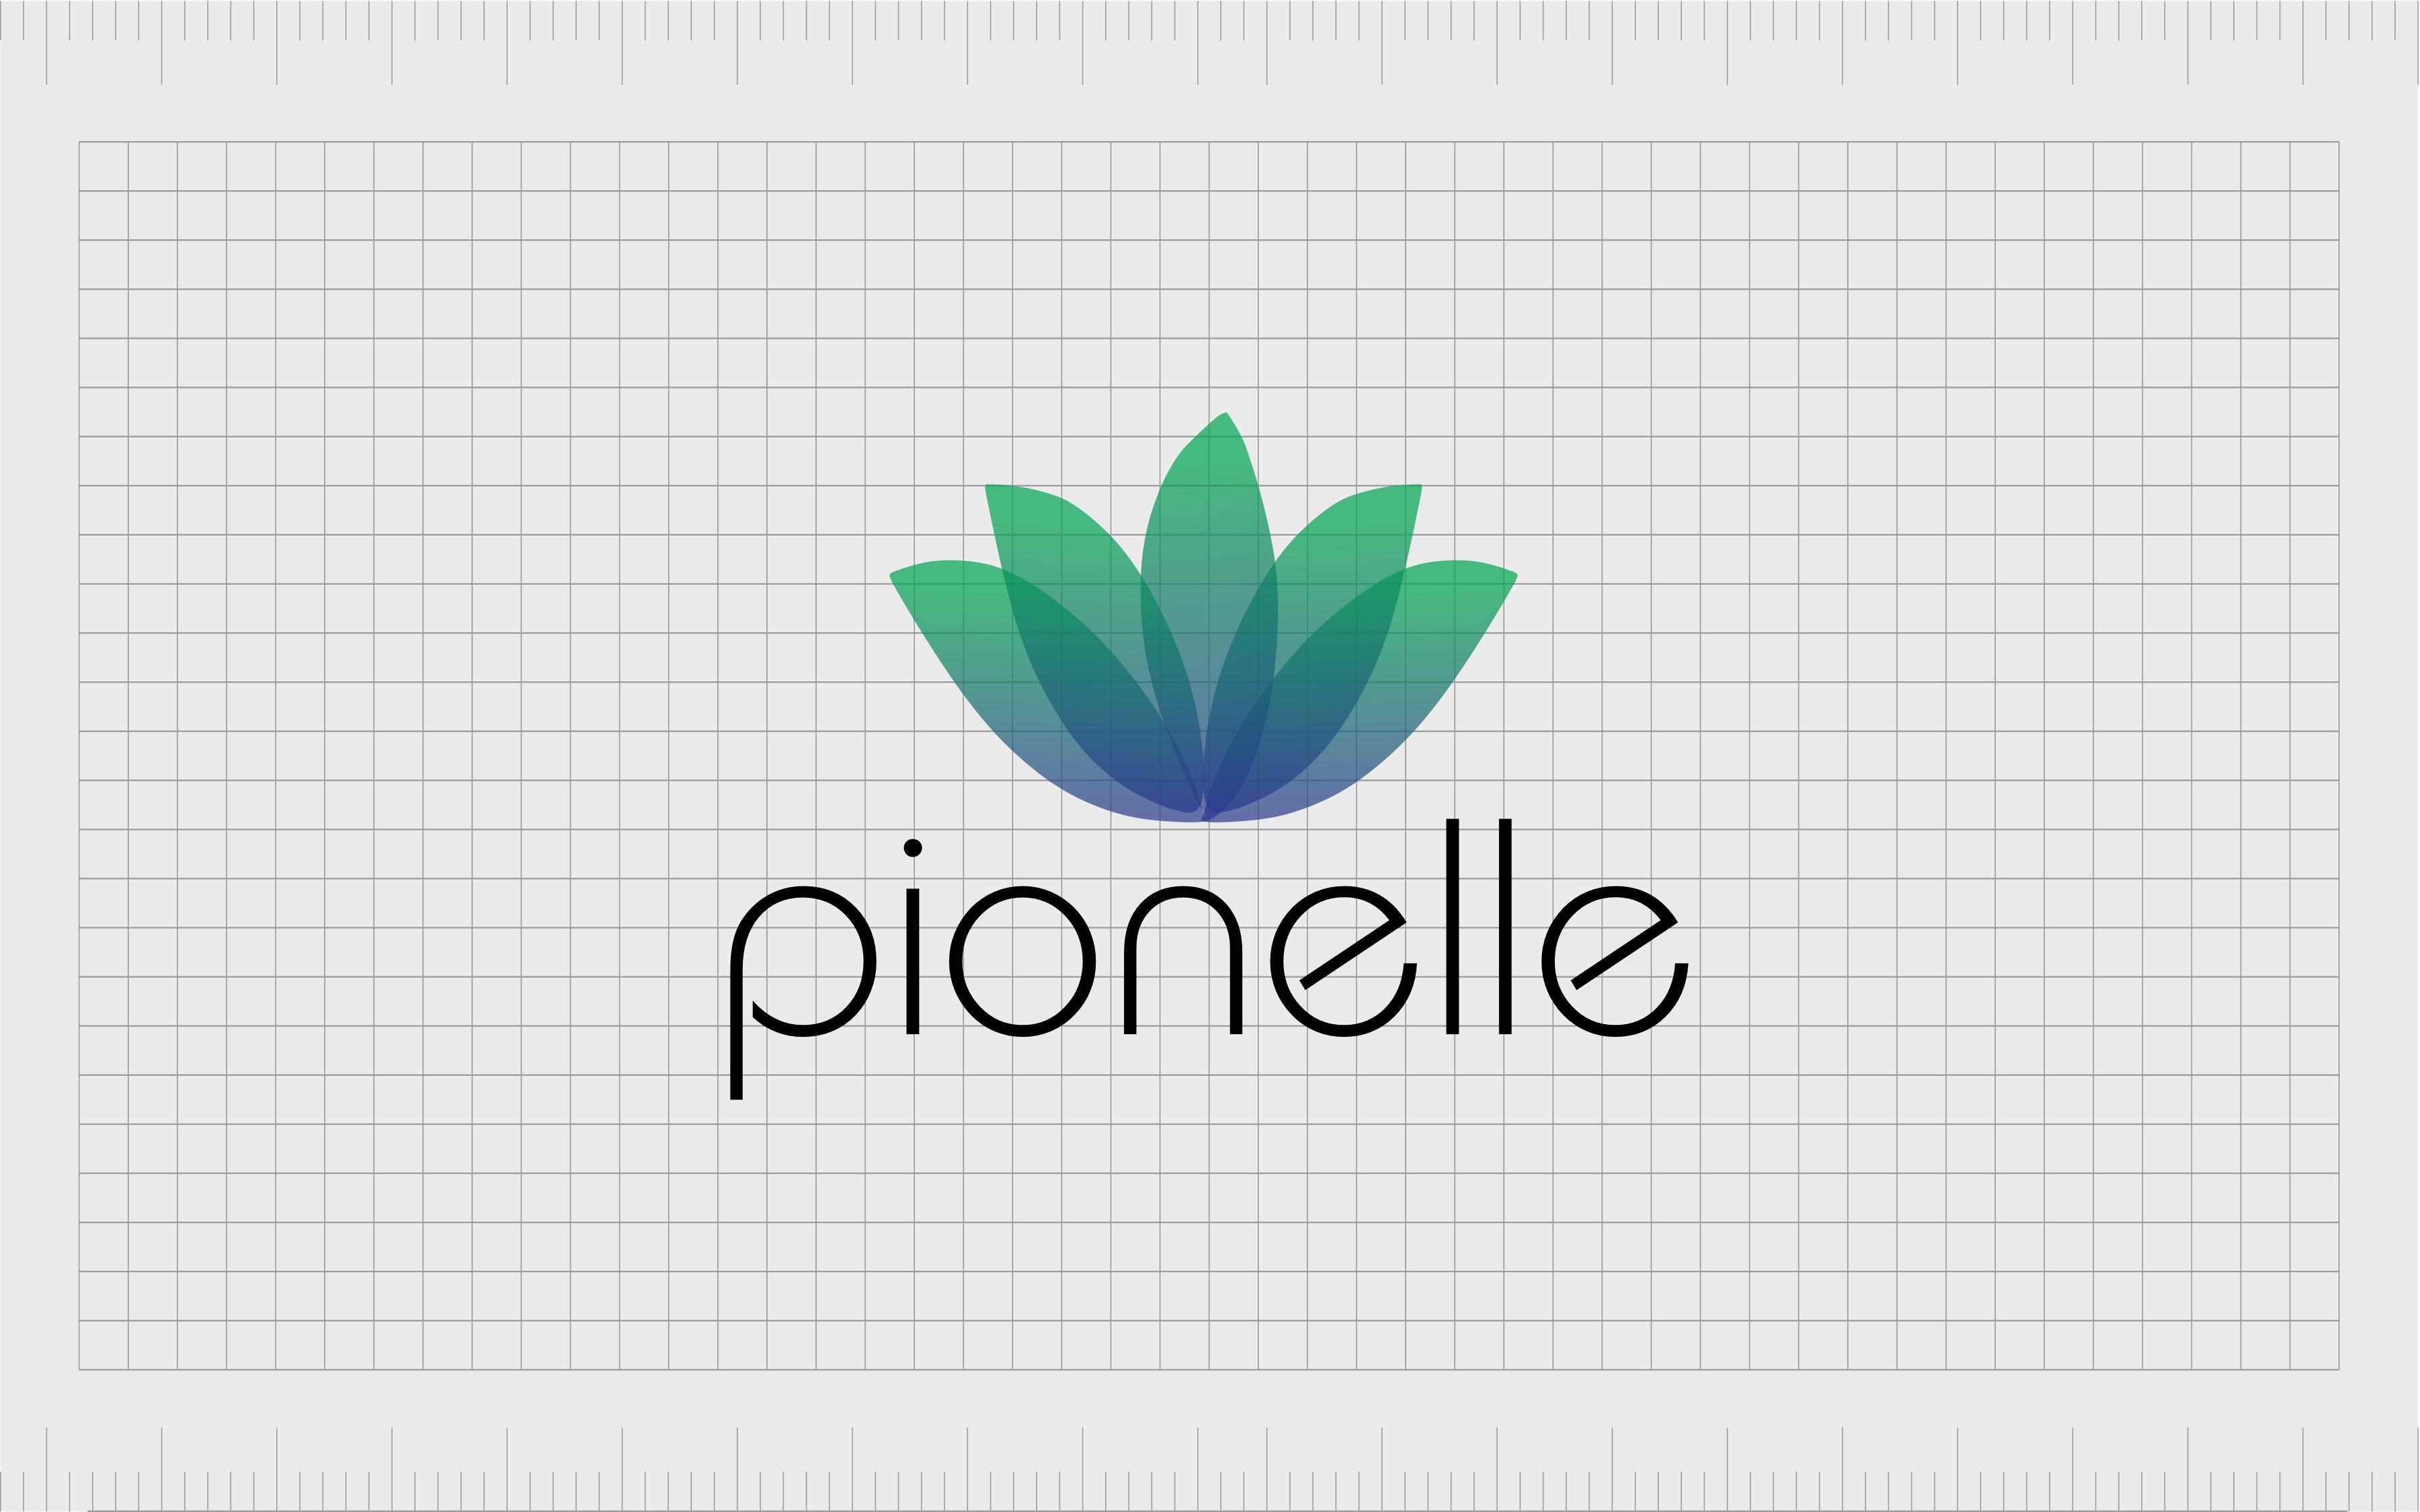 Pionelle